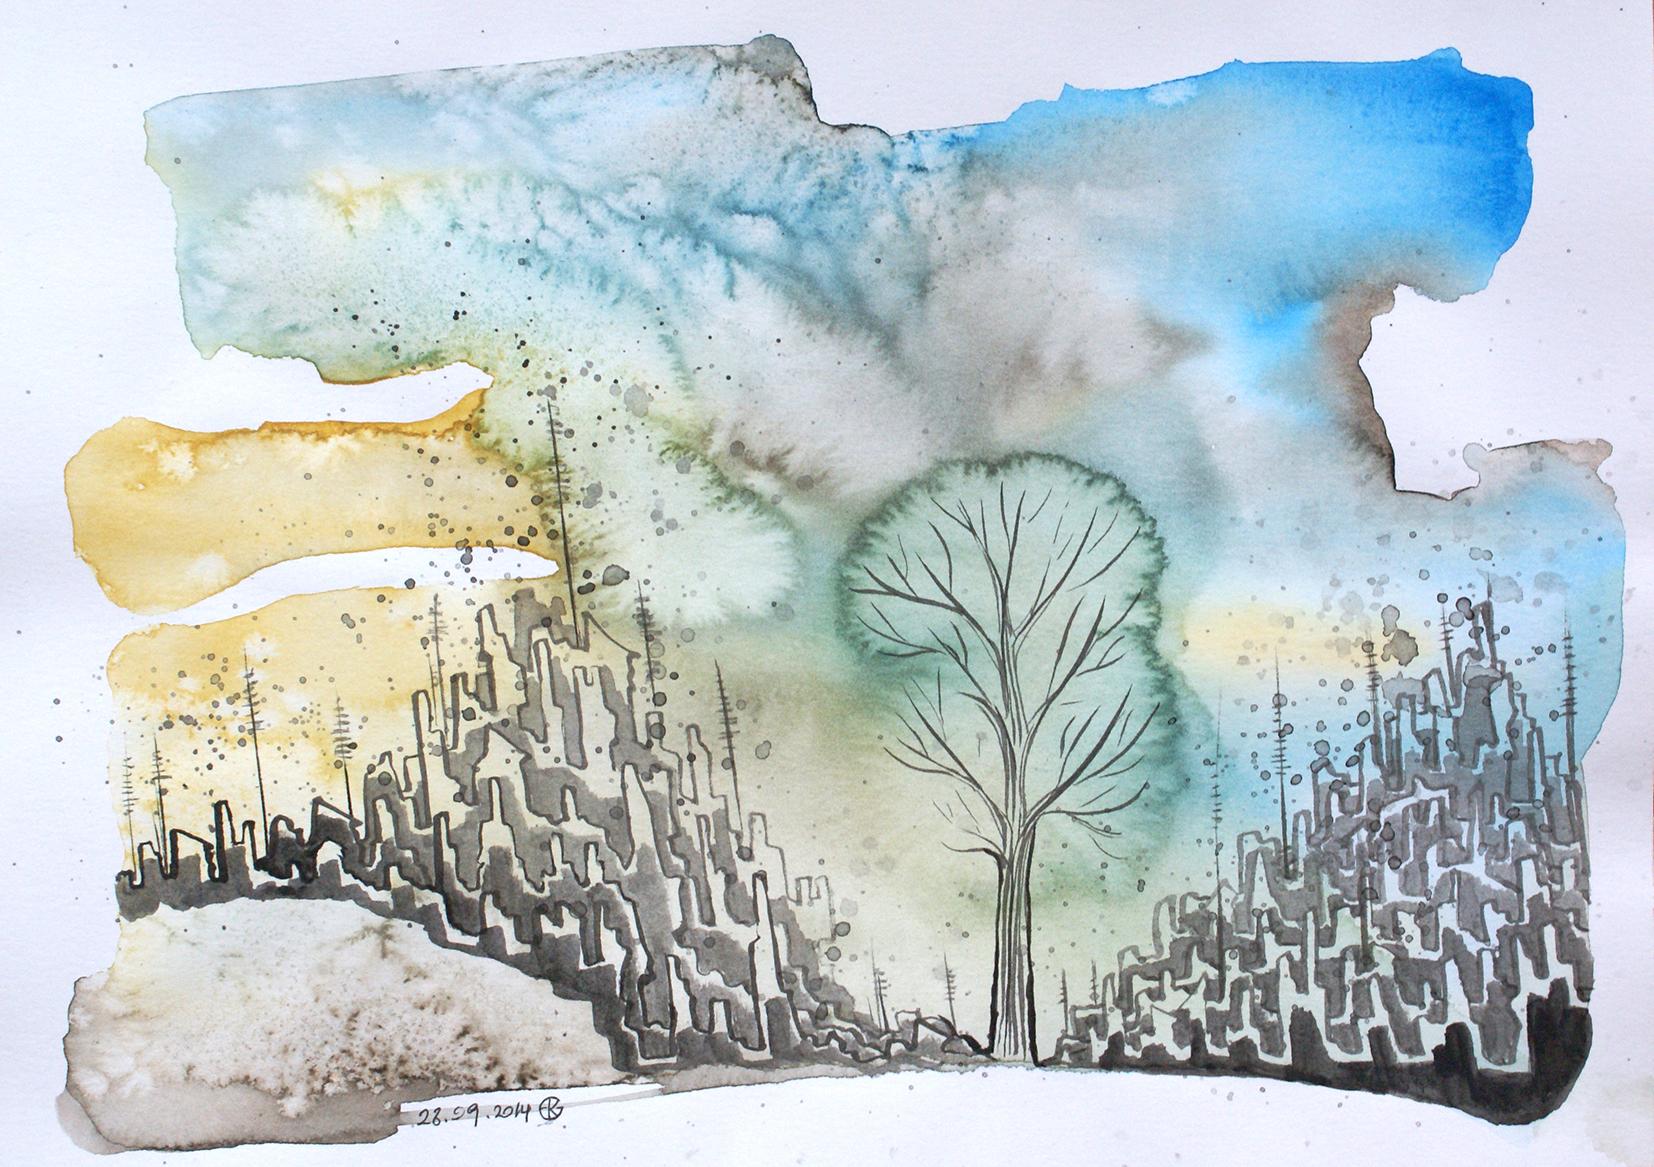 Under Siege, 2014 | Watercolour & ink on paper | 21 x 30 cm | £370